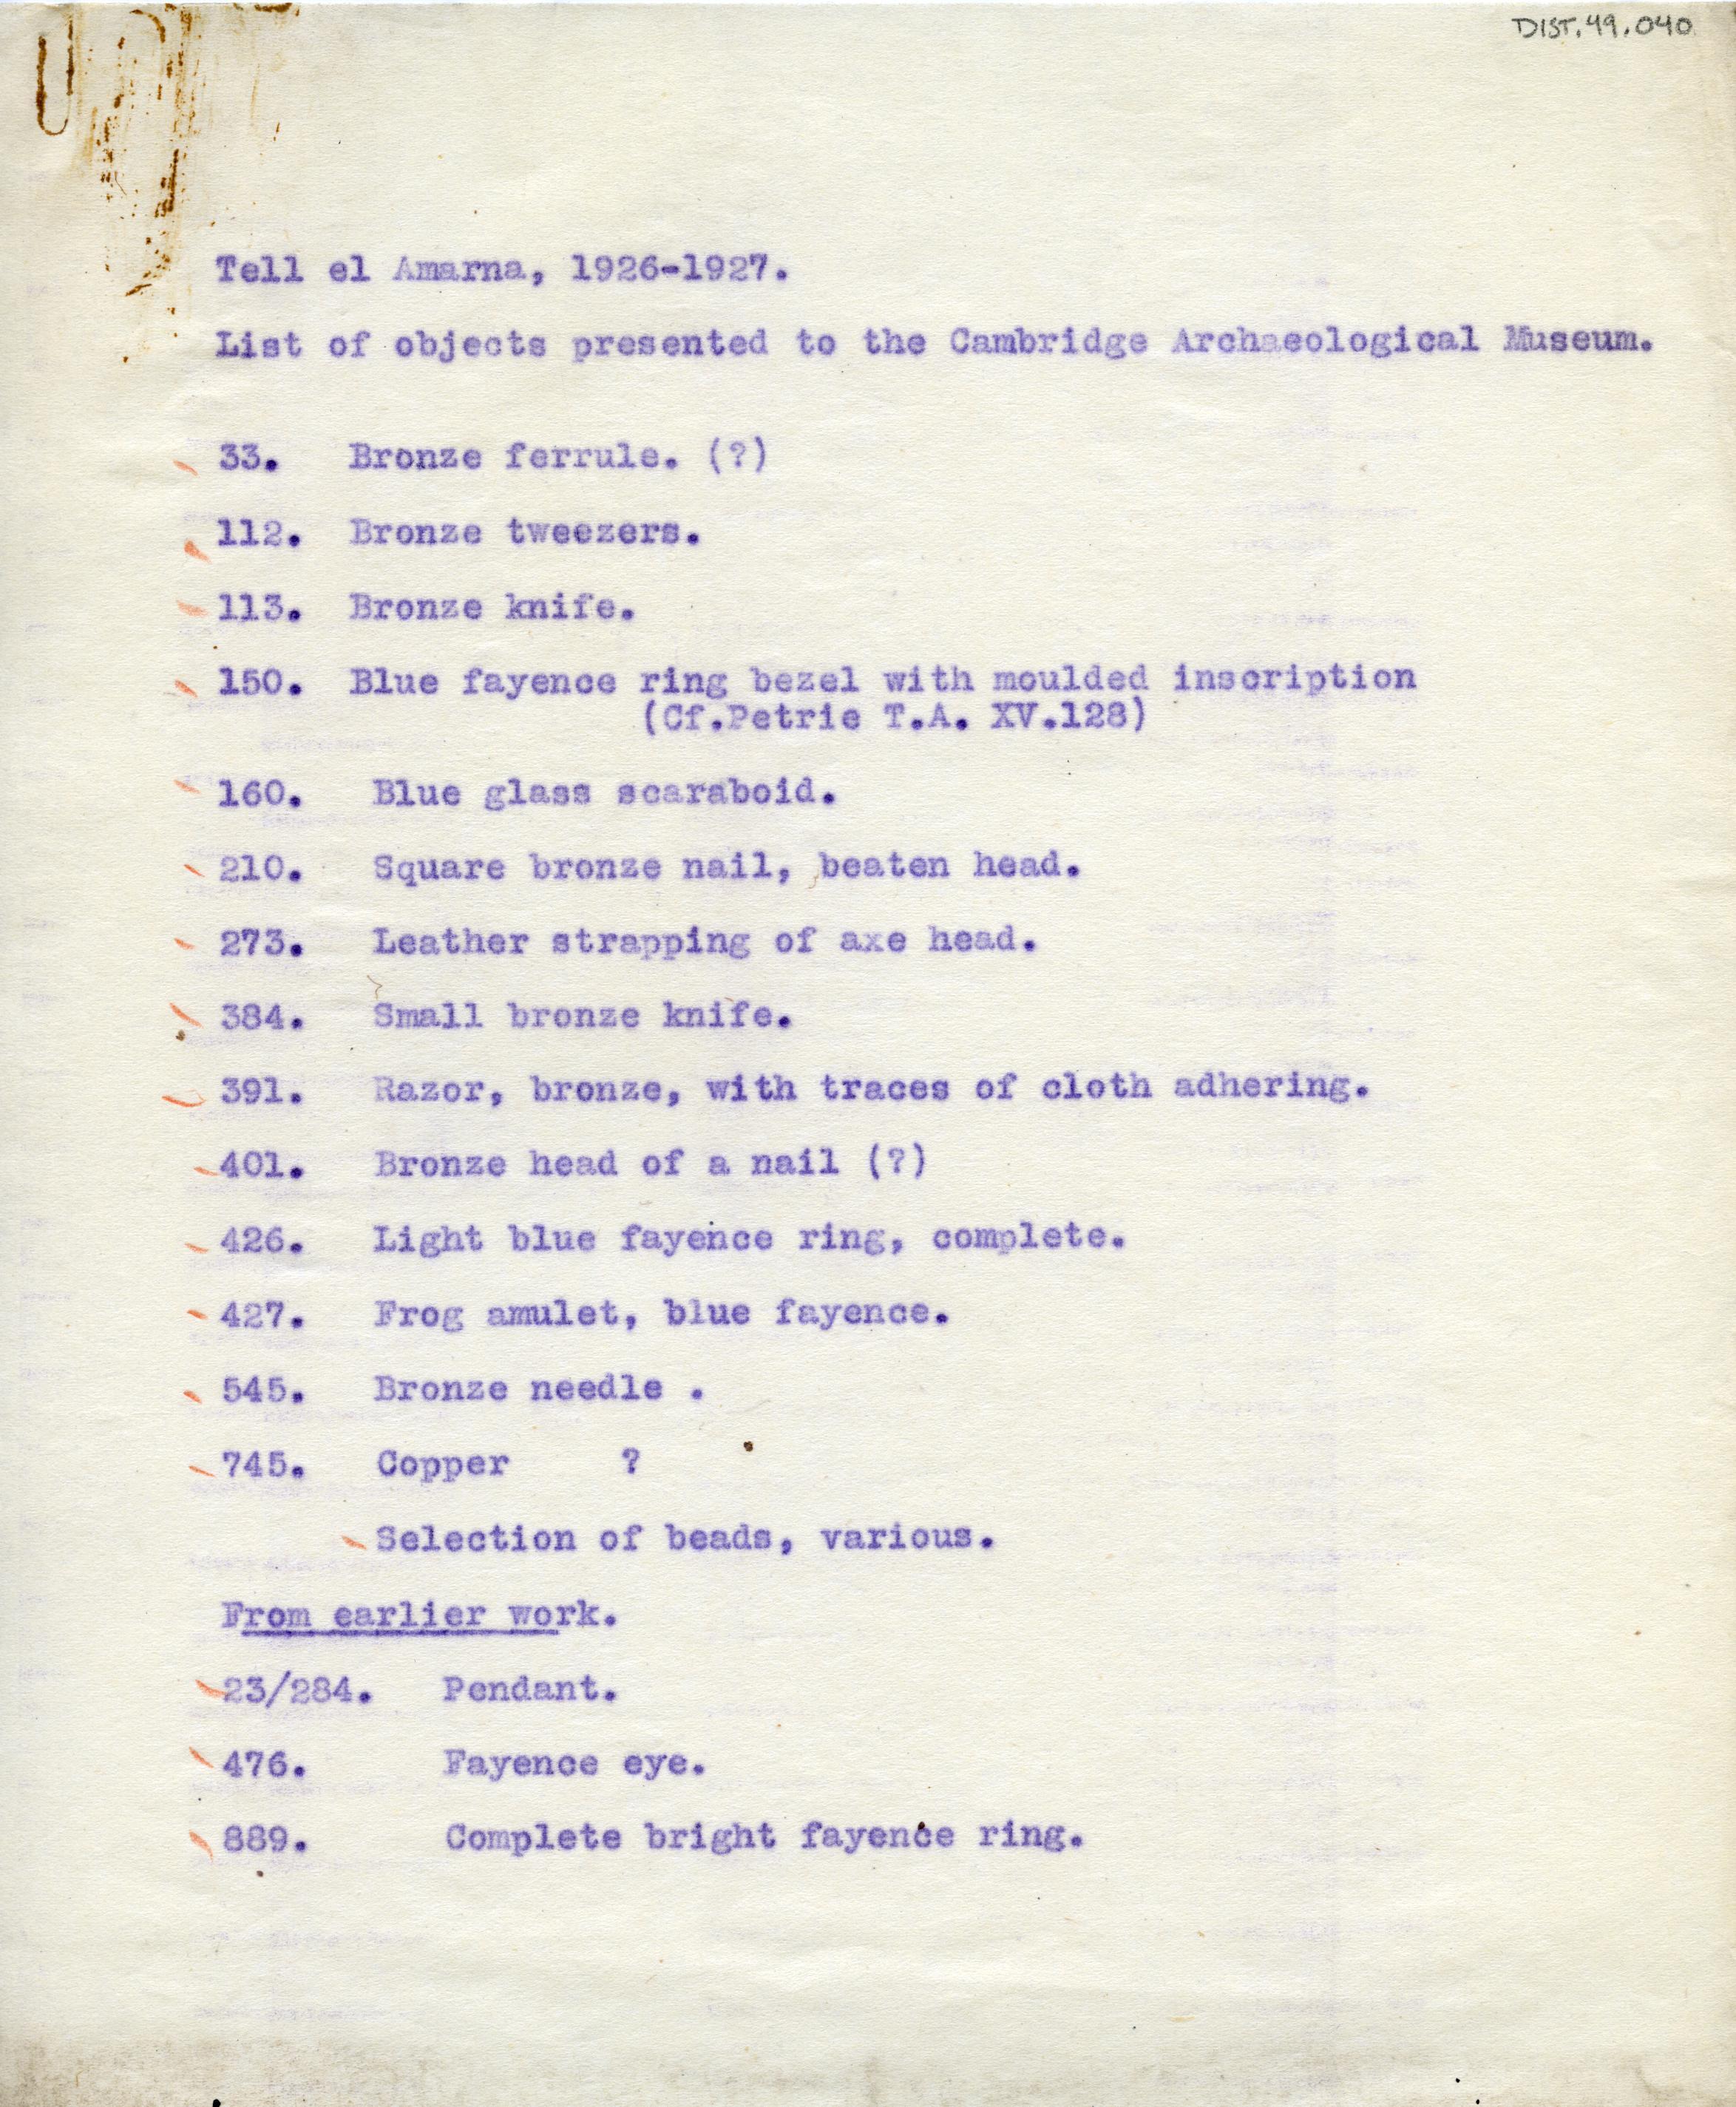 1926-27 el-Amarna DIST.49.040